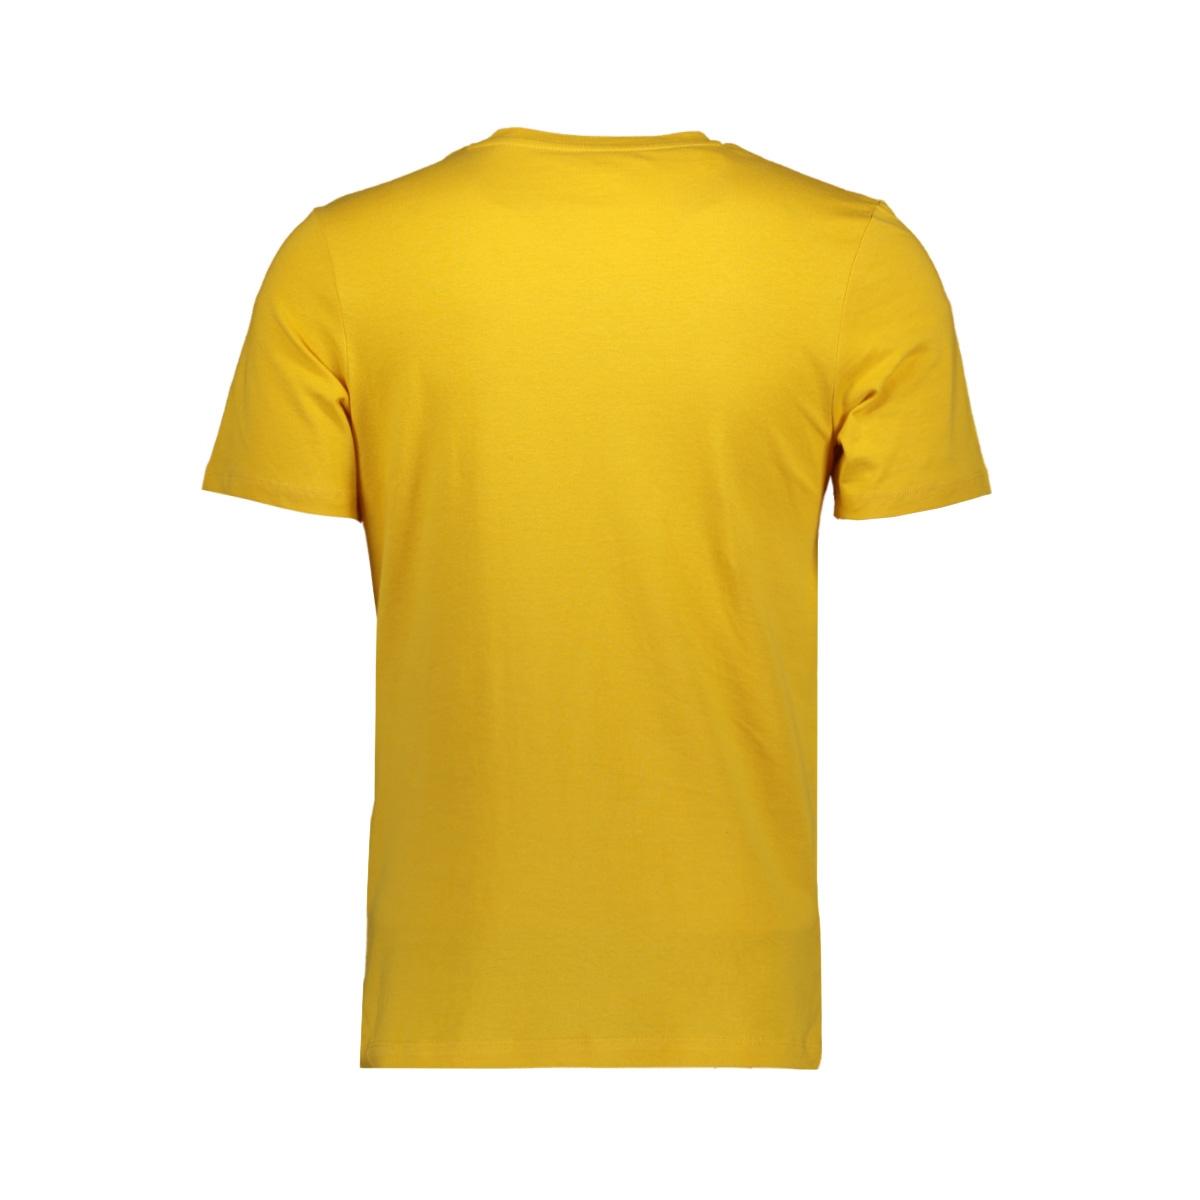 jorpainter tee ss crew neck ka 12179411 jack & jones t-shirt yolk yellow/slim